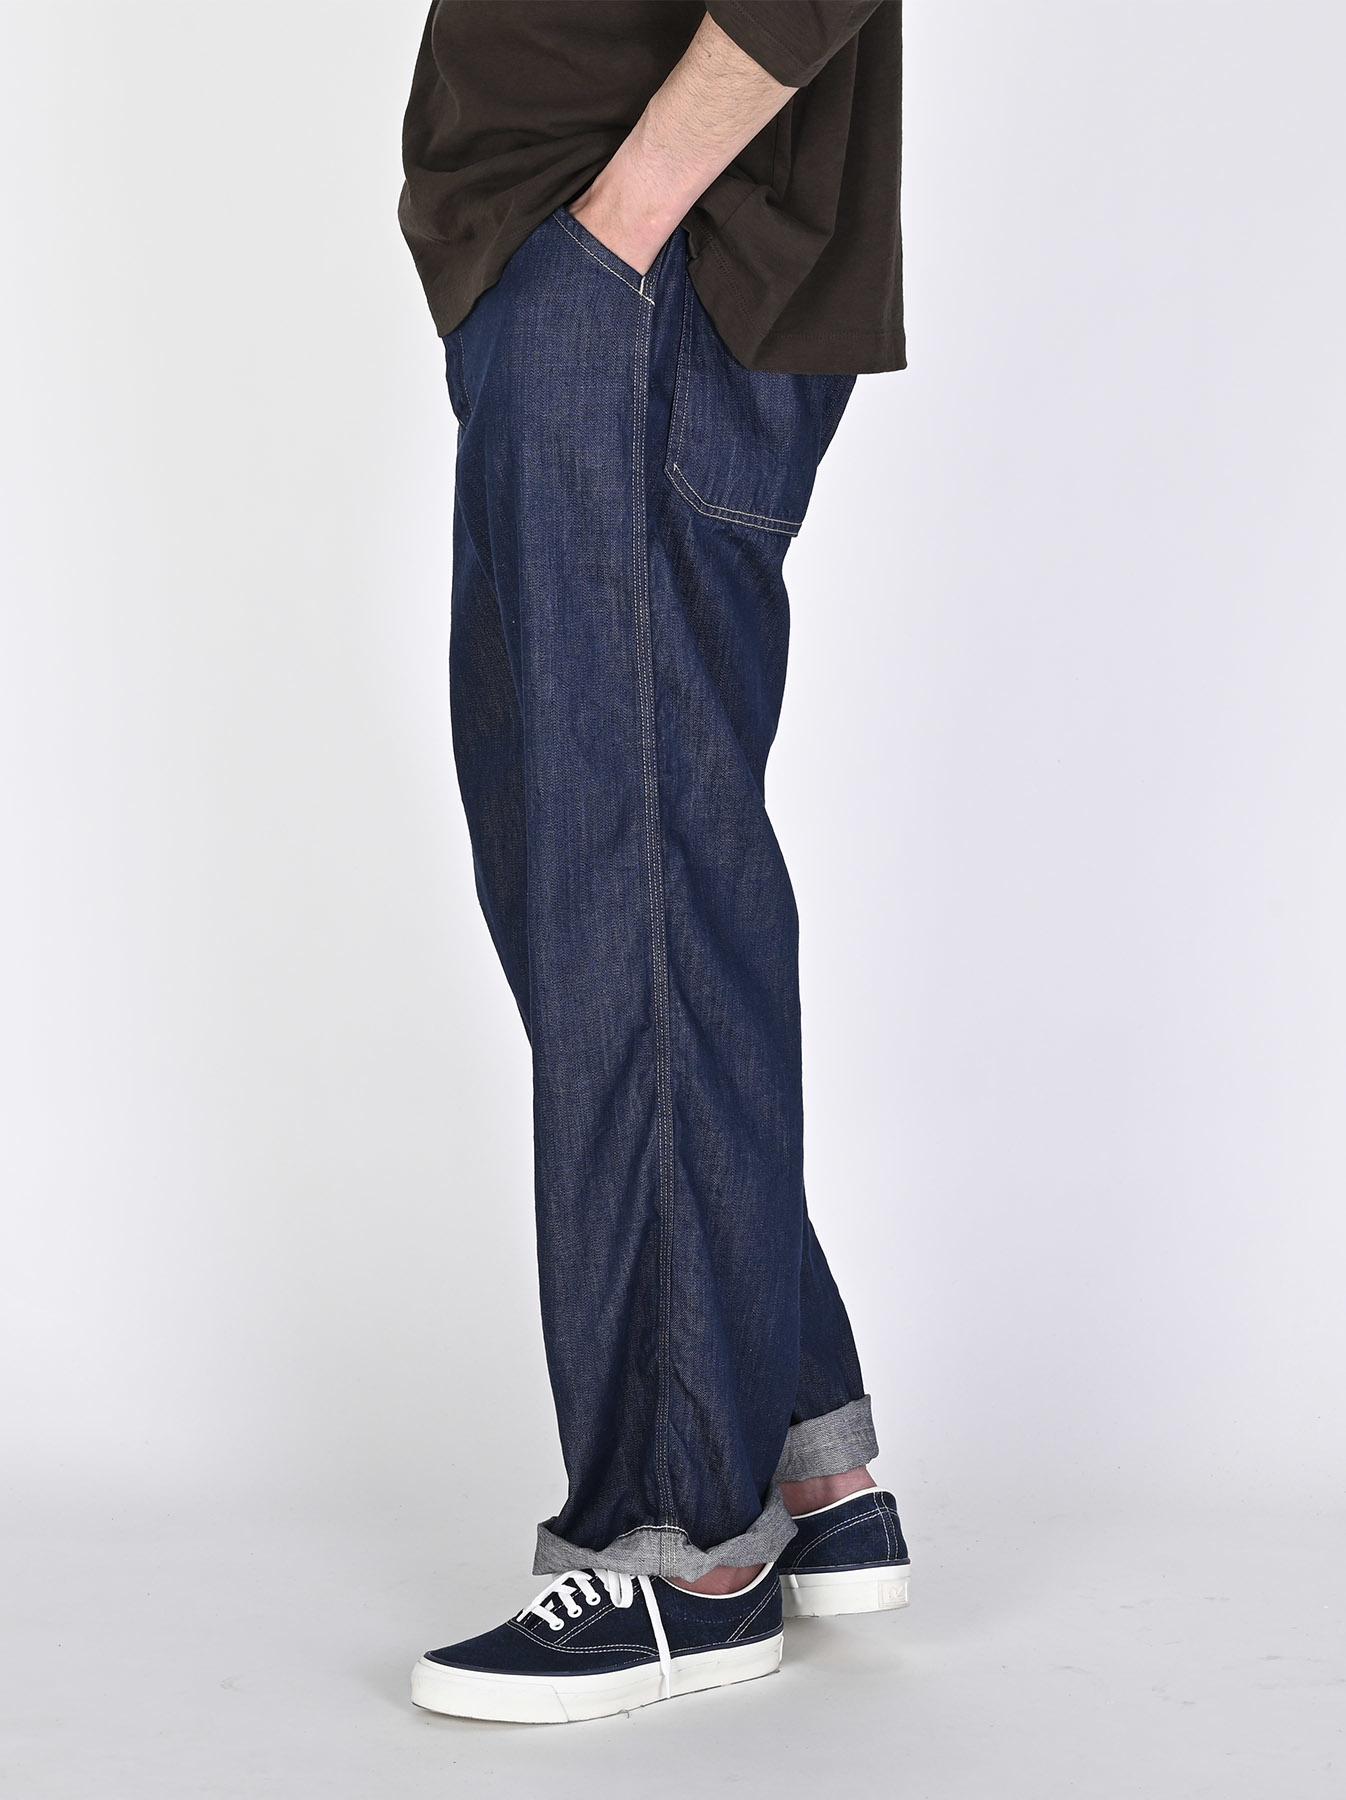 Indigo Nou 908 Painter Pants (0721)-3